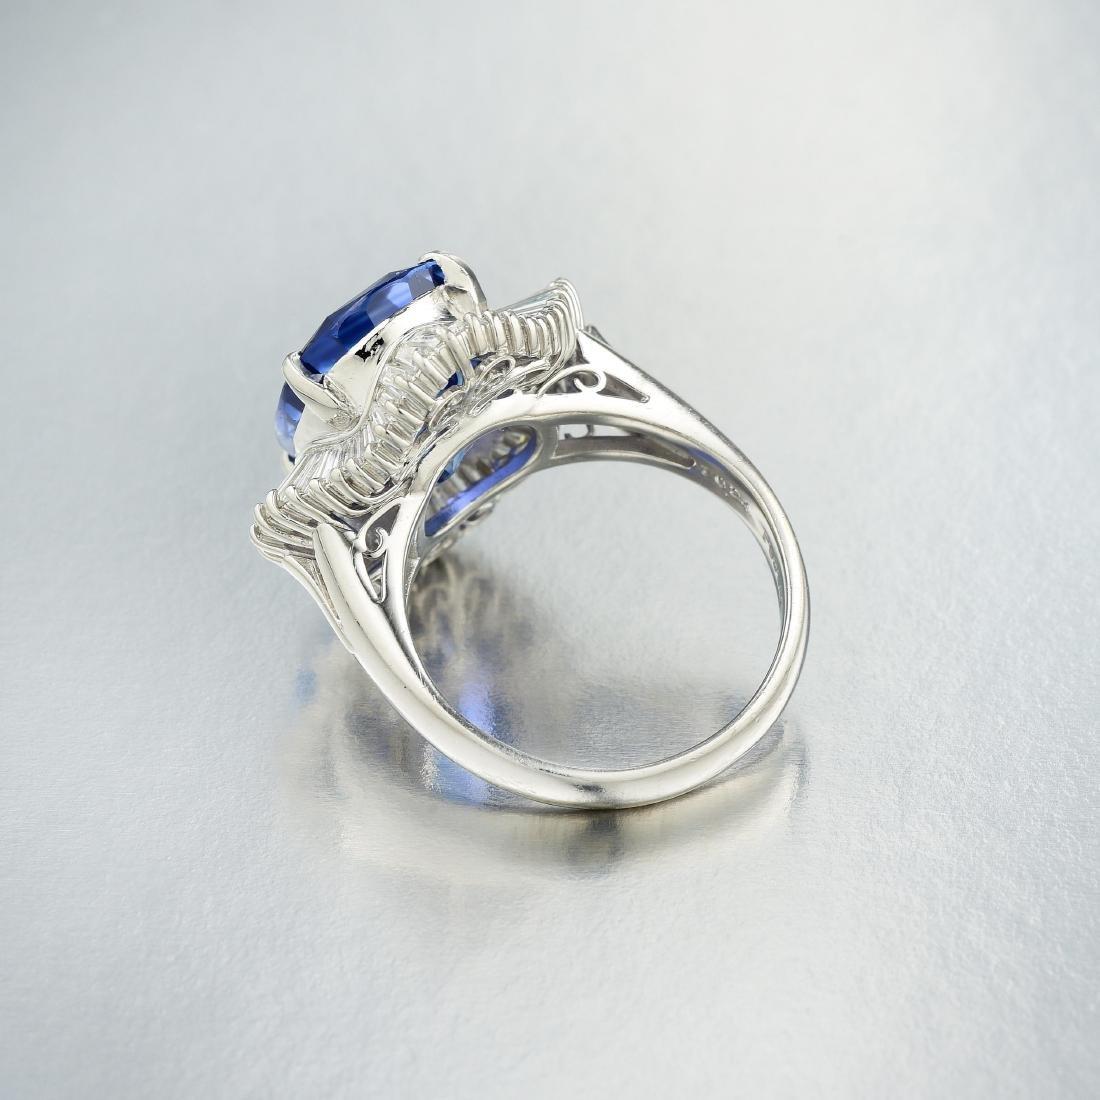 A 10.24-Carat Sapphire and Diamond Ballerina Ring - 3